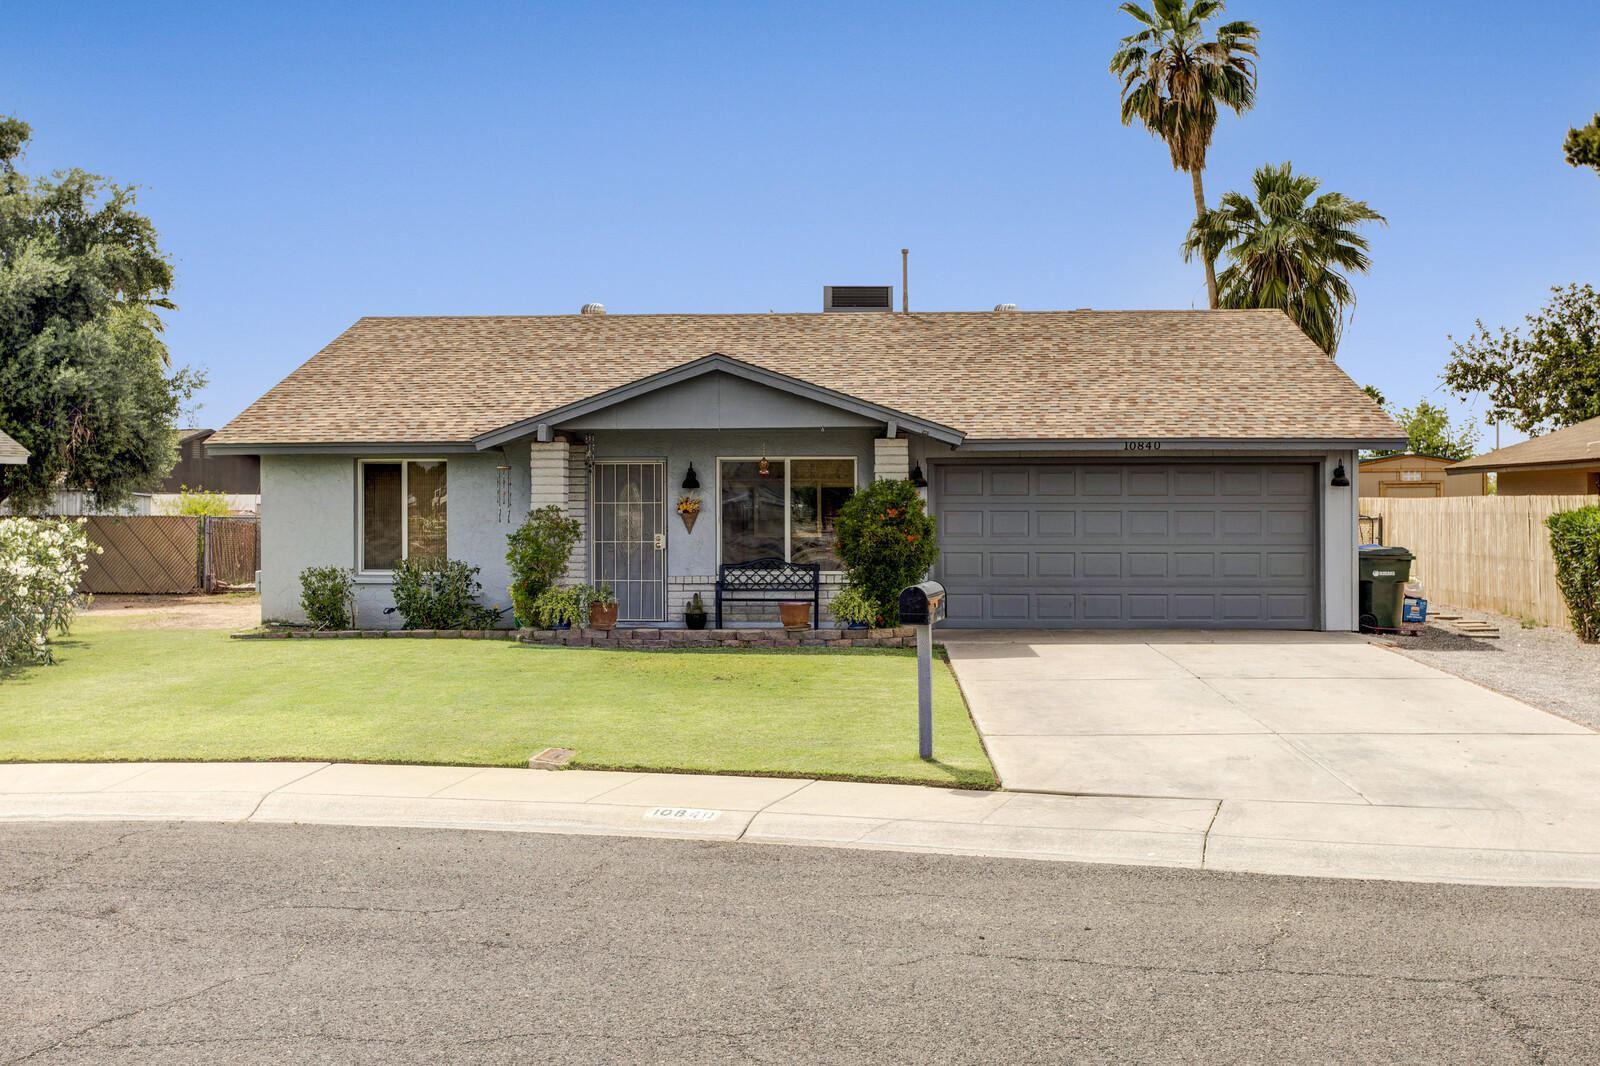 Photo of 10840 N 44TH Avenue, Glendale, AZ 85304 (MLS # 6233735)